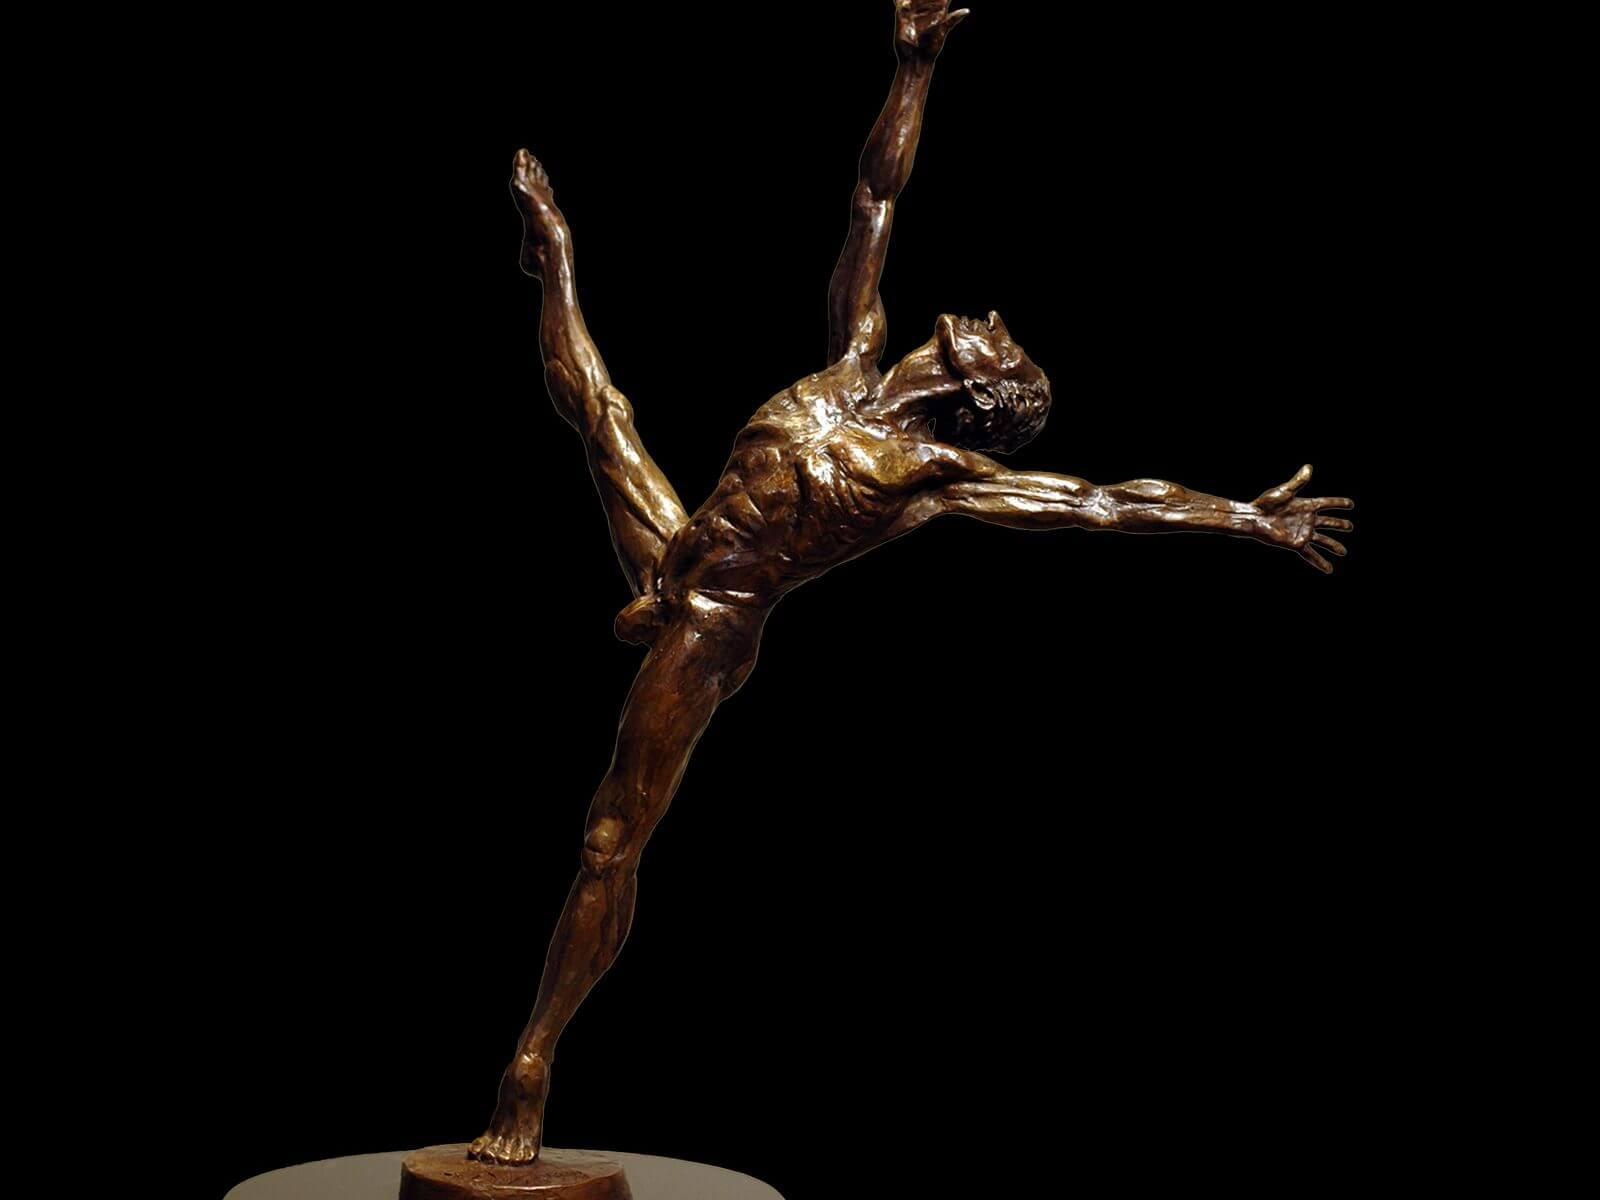 Soul Dance a medium size male bronze dance figurative sculpture by Andrew DeVries